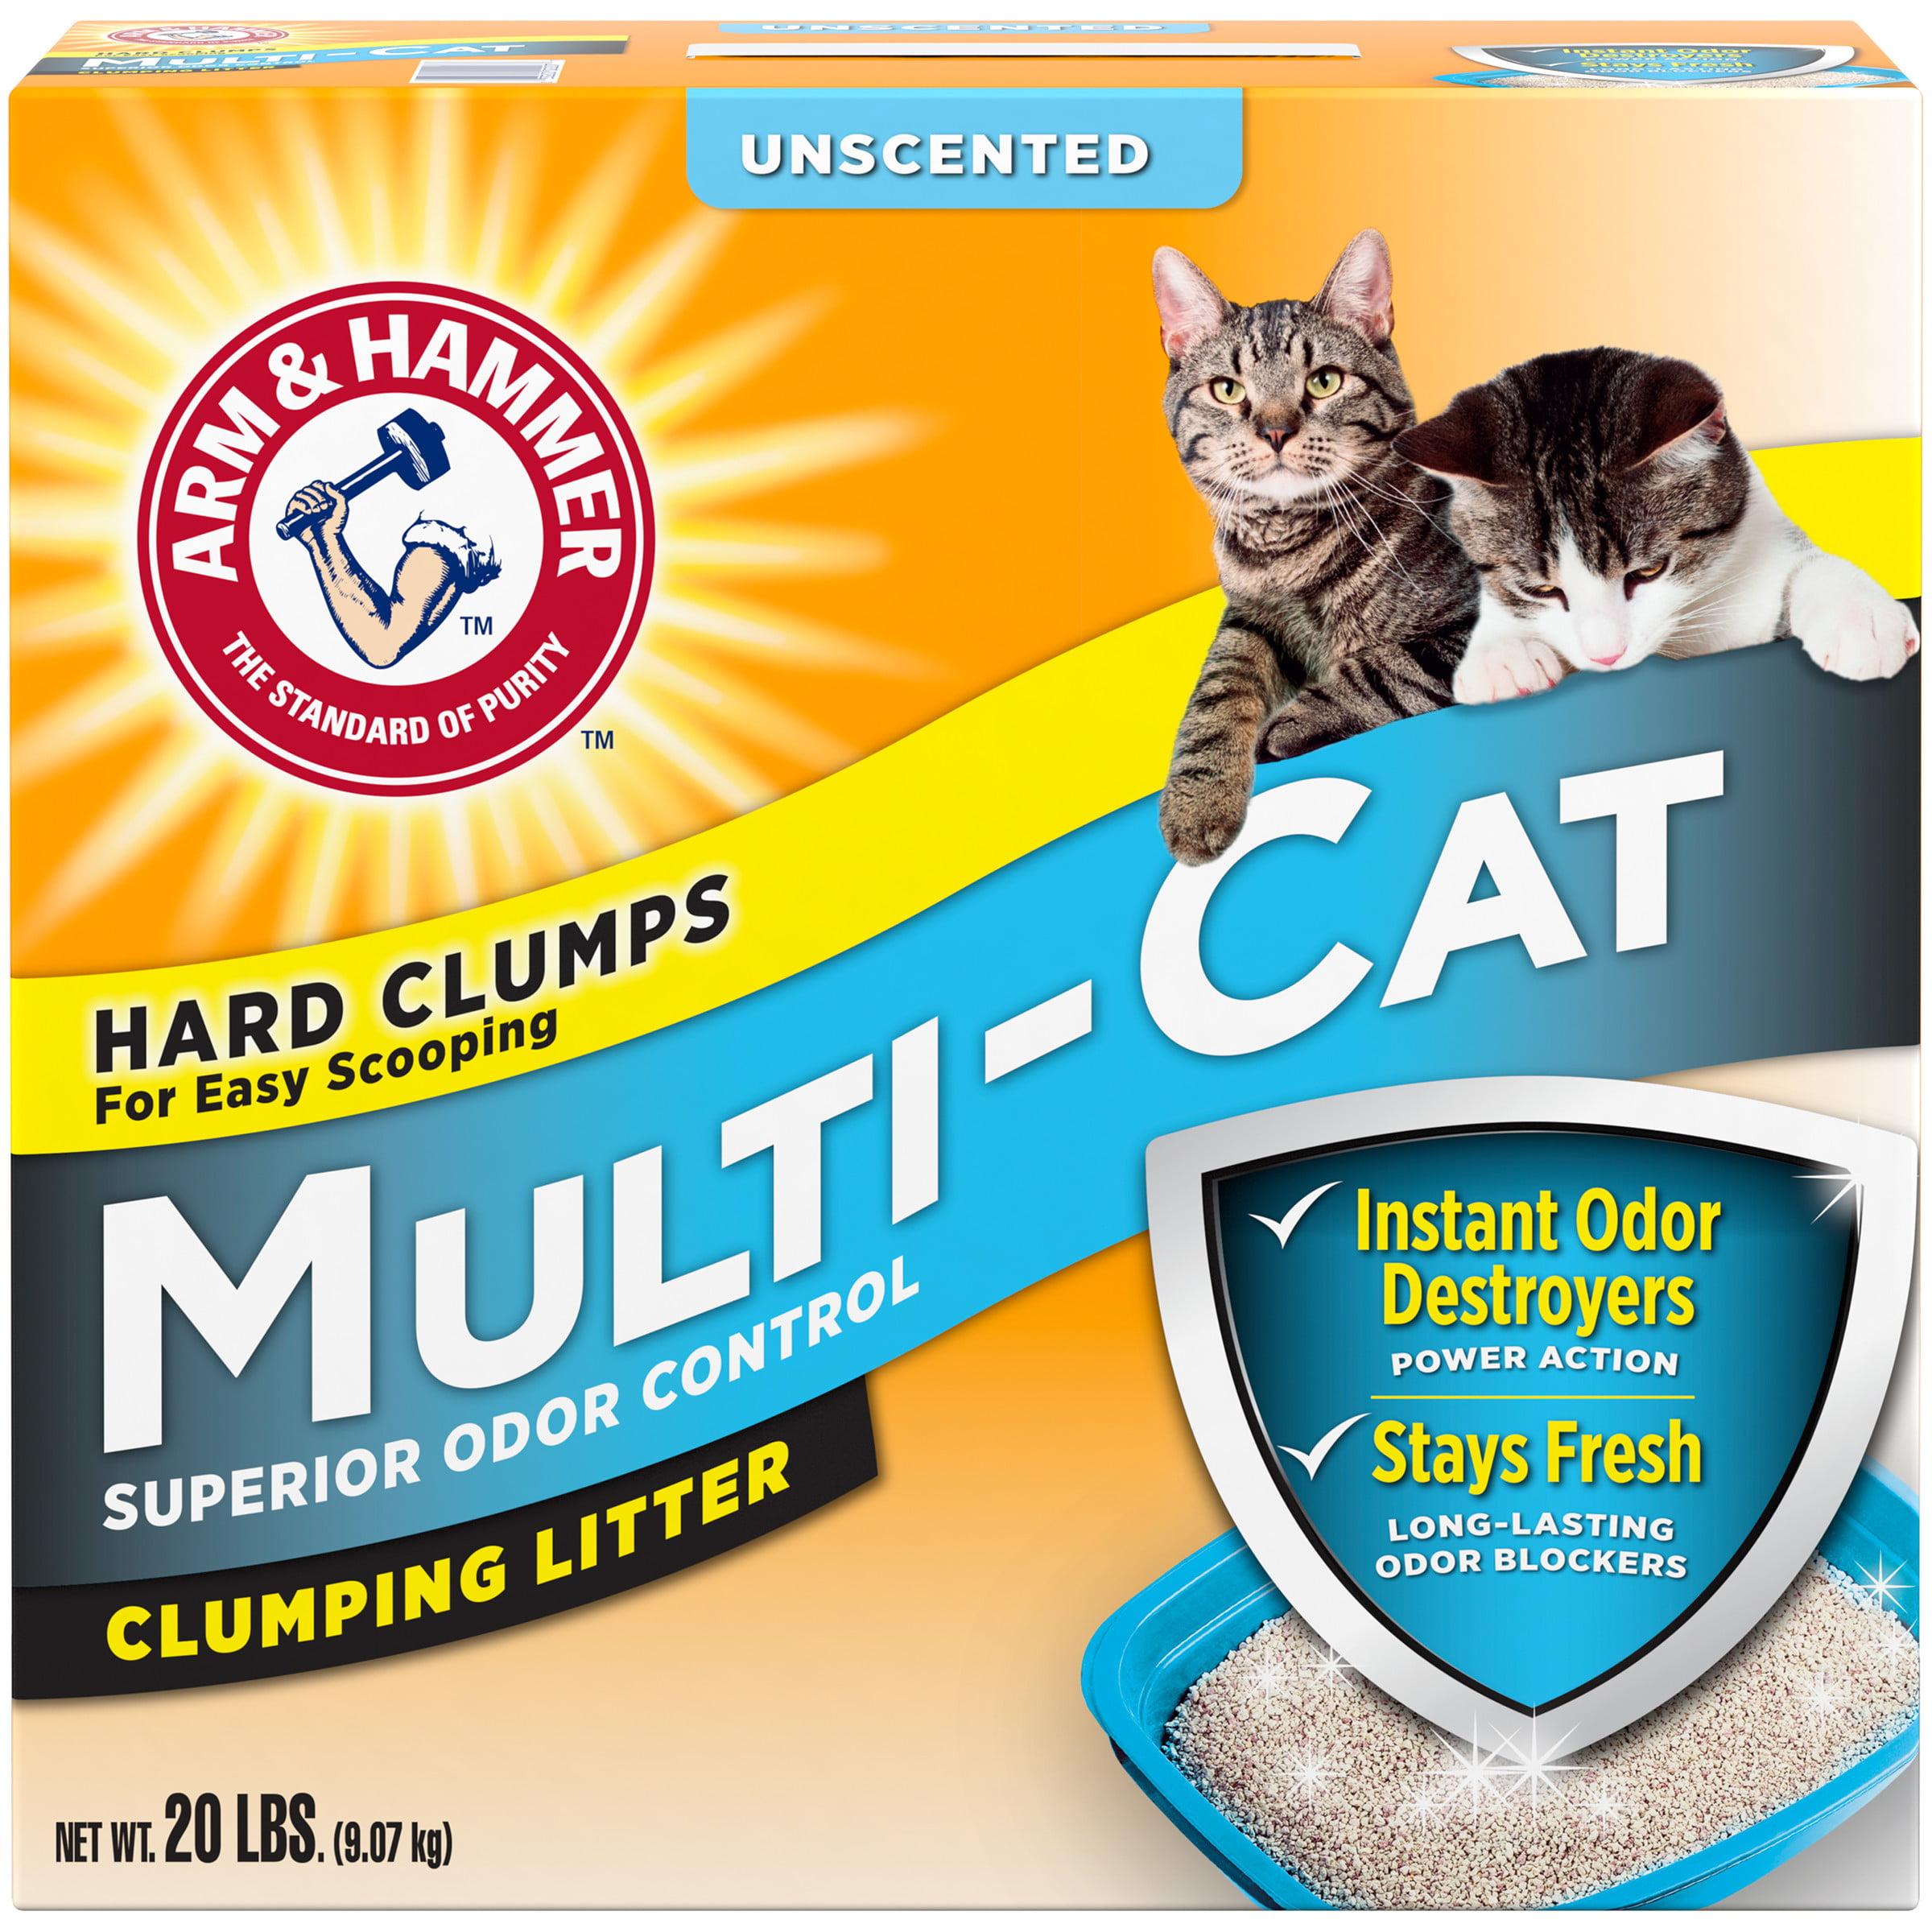 Arm & Hammer Multi-Cat Unscented Clumping Cat Litter, 20 Lb.